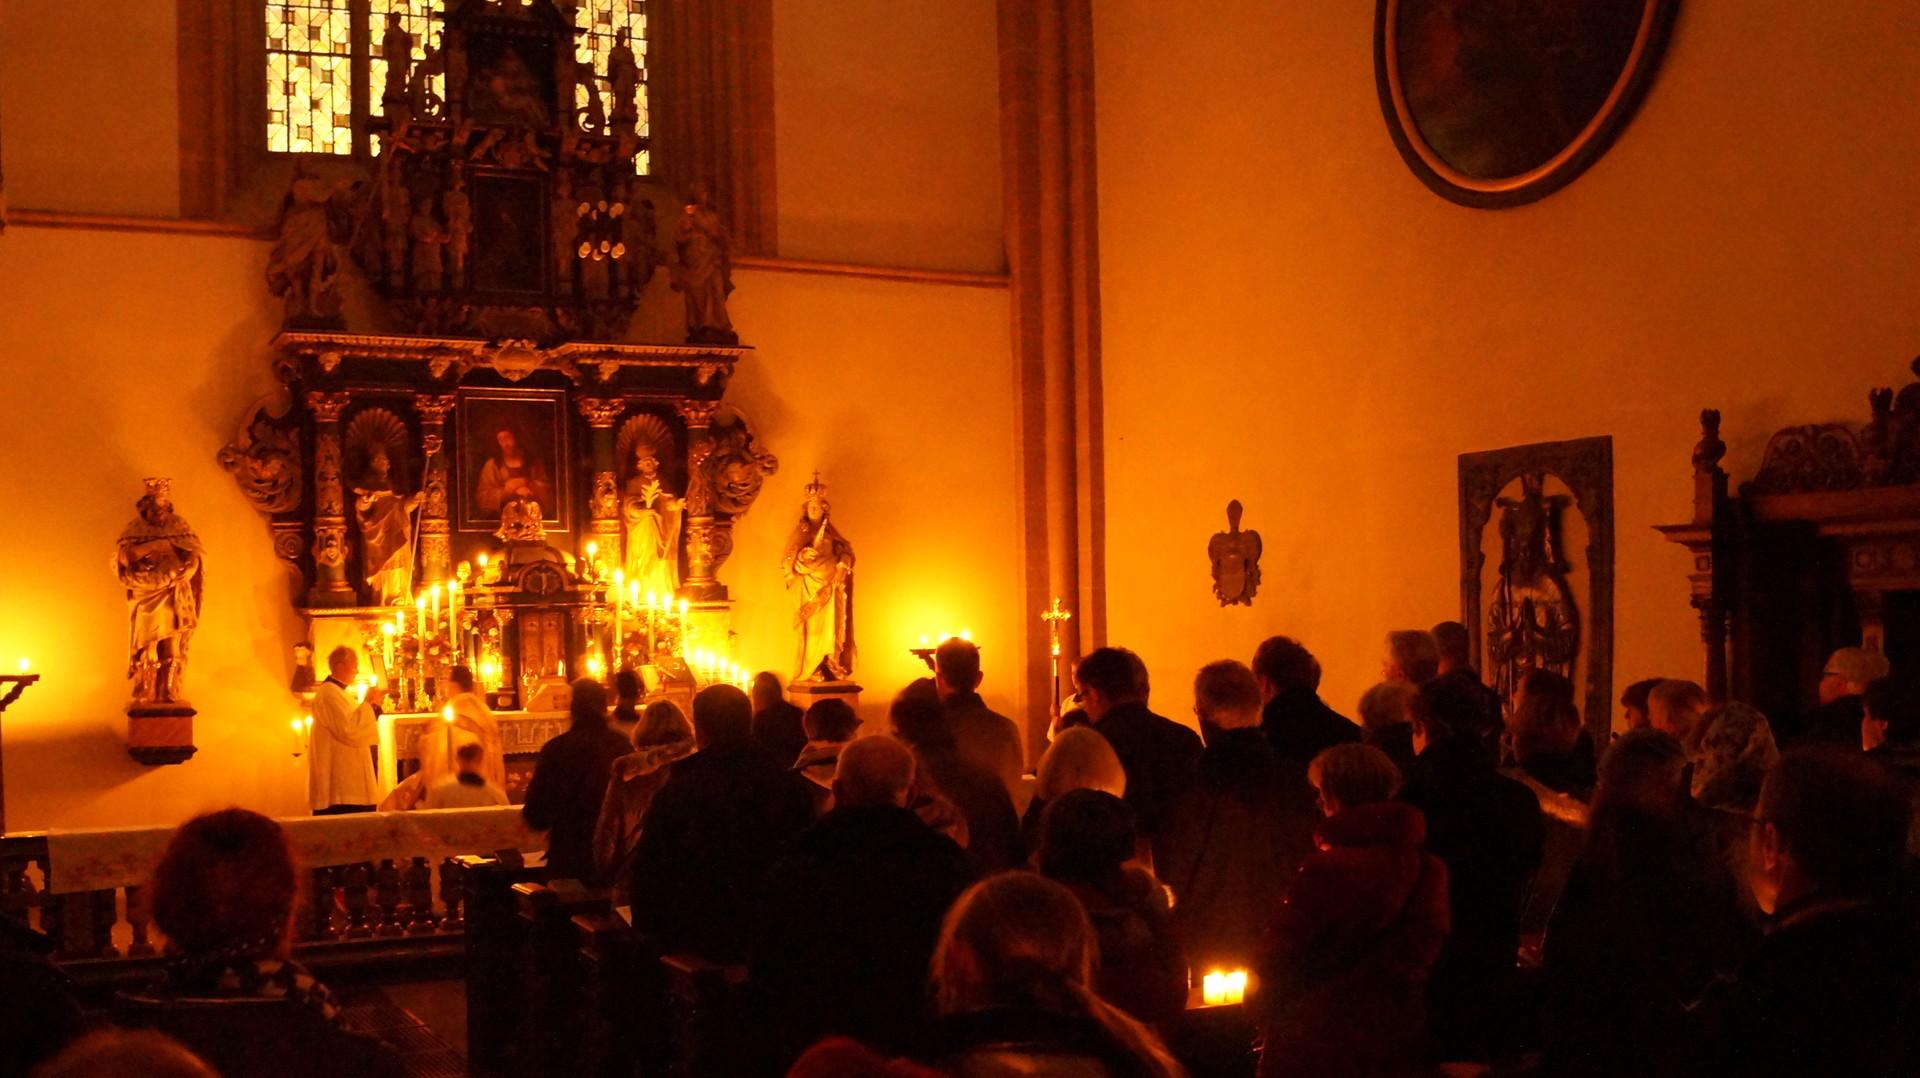 Missa Tridentina am Kreuzaltar